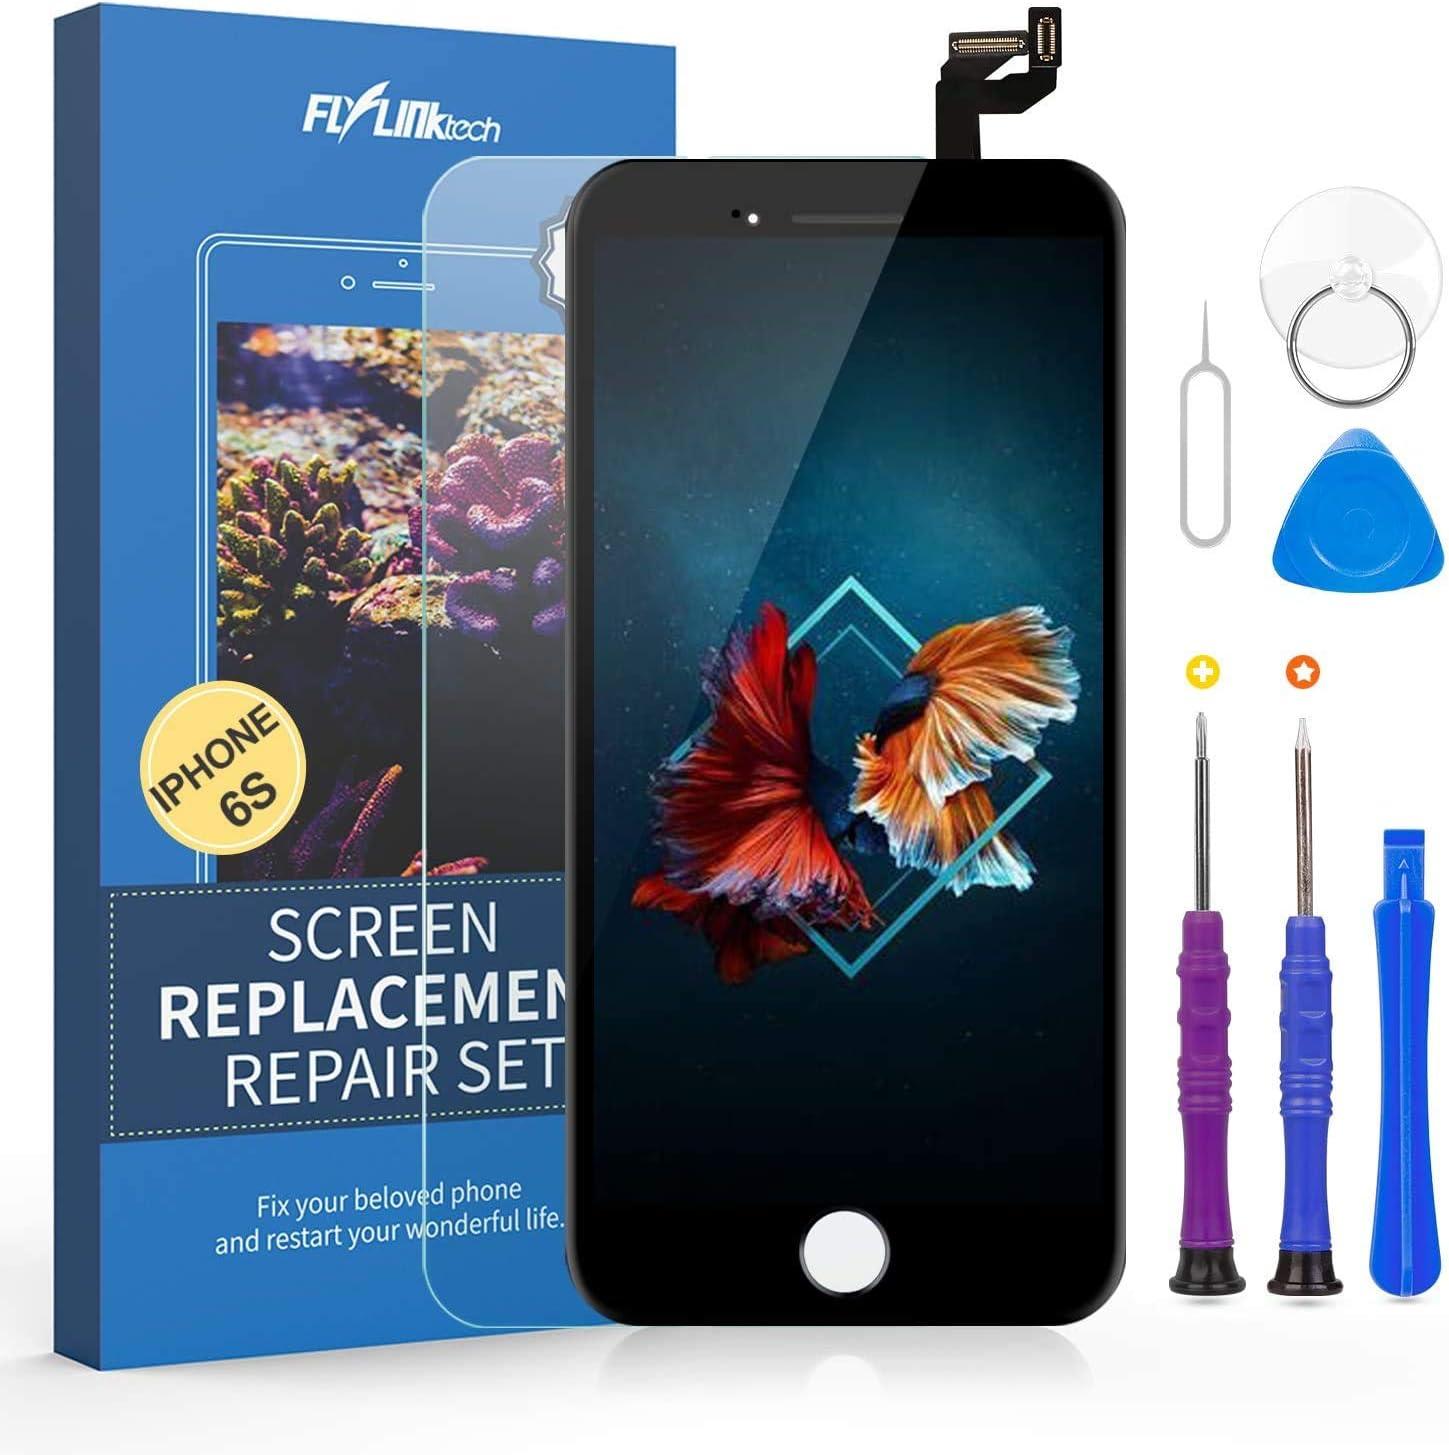 FLYLINKTECH Pantalla Táctil LCD Reemplazo para iPhone 6s Negro 4.7